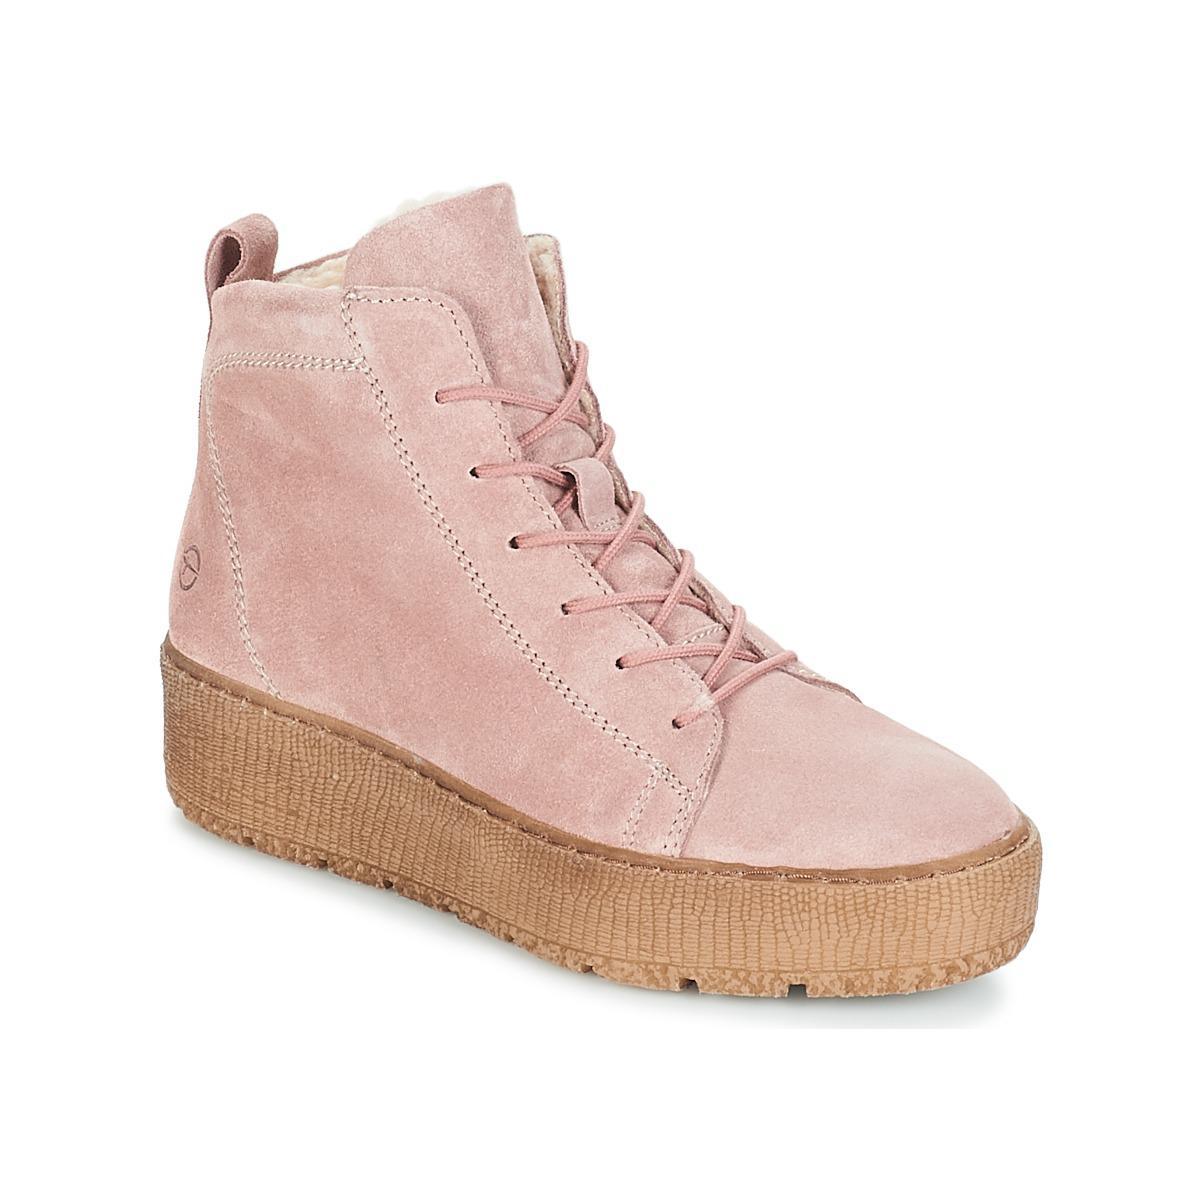 d5d44b0435538d Tamaris - Pink IMAN femmes Chaussures en rose - Lyst. Afficher en plein  écran